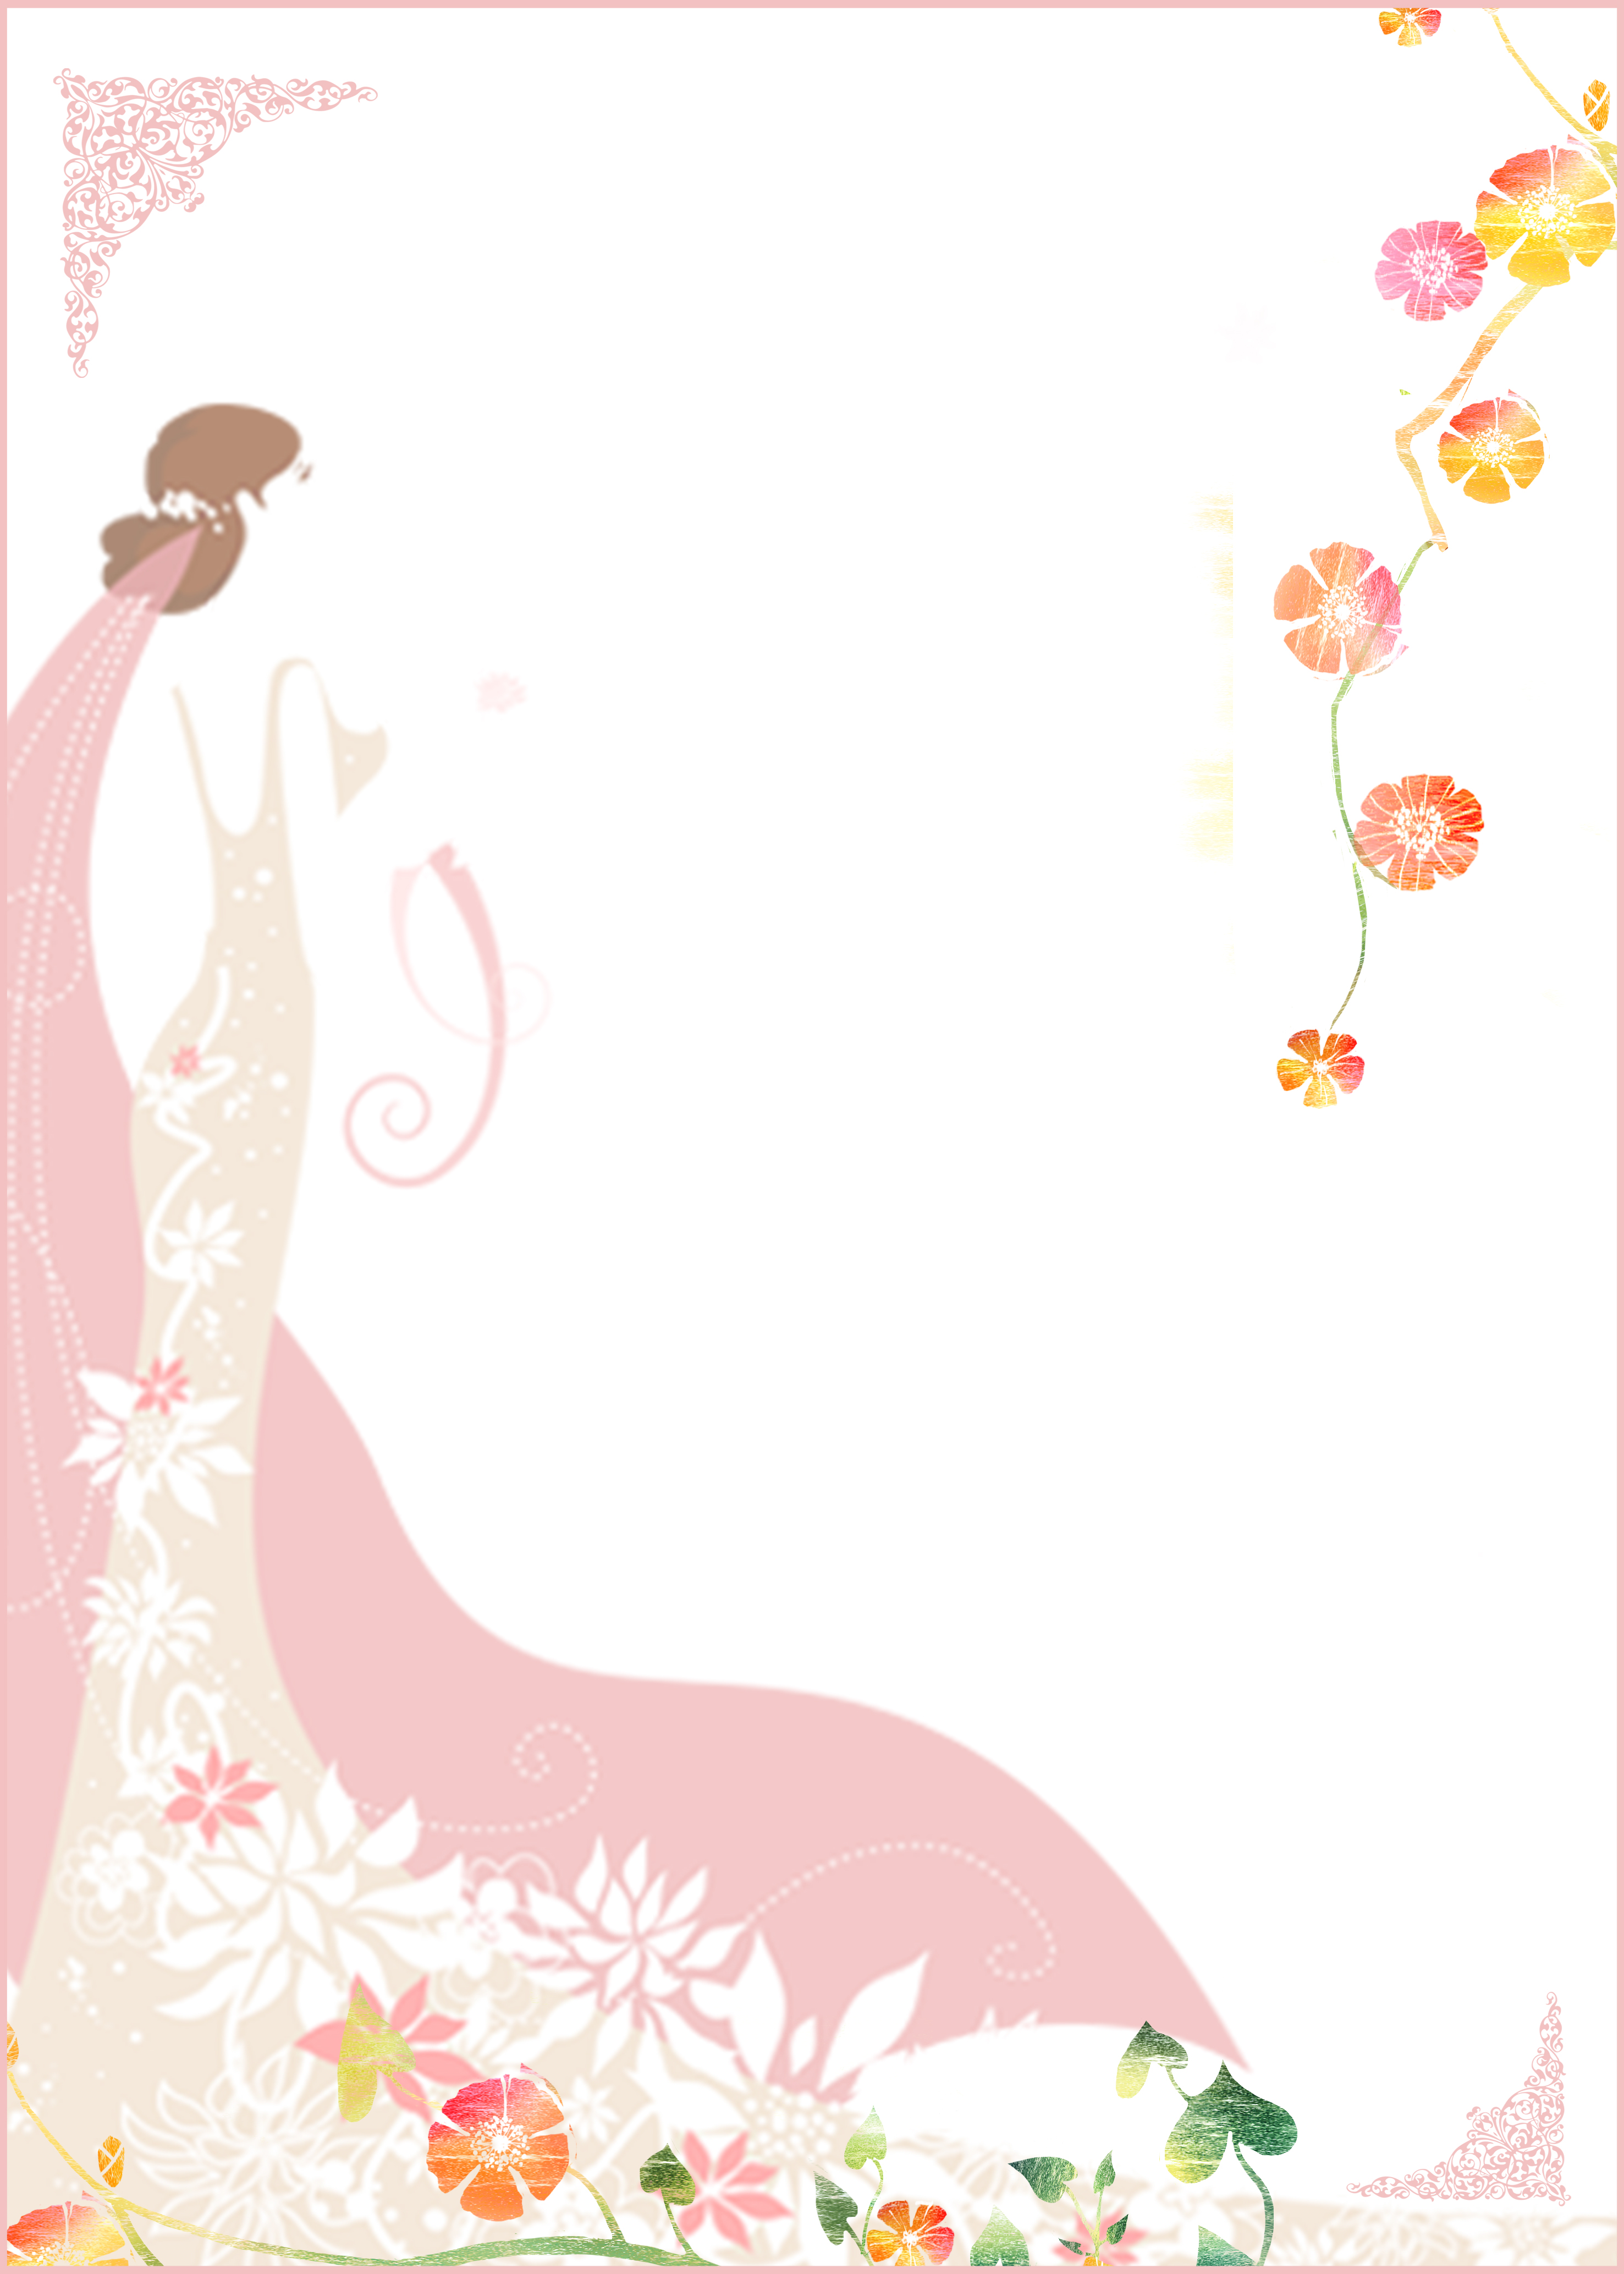 Romantic Aesthetic Wedding Poster